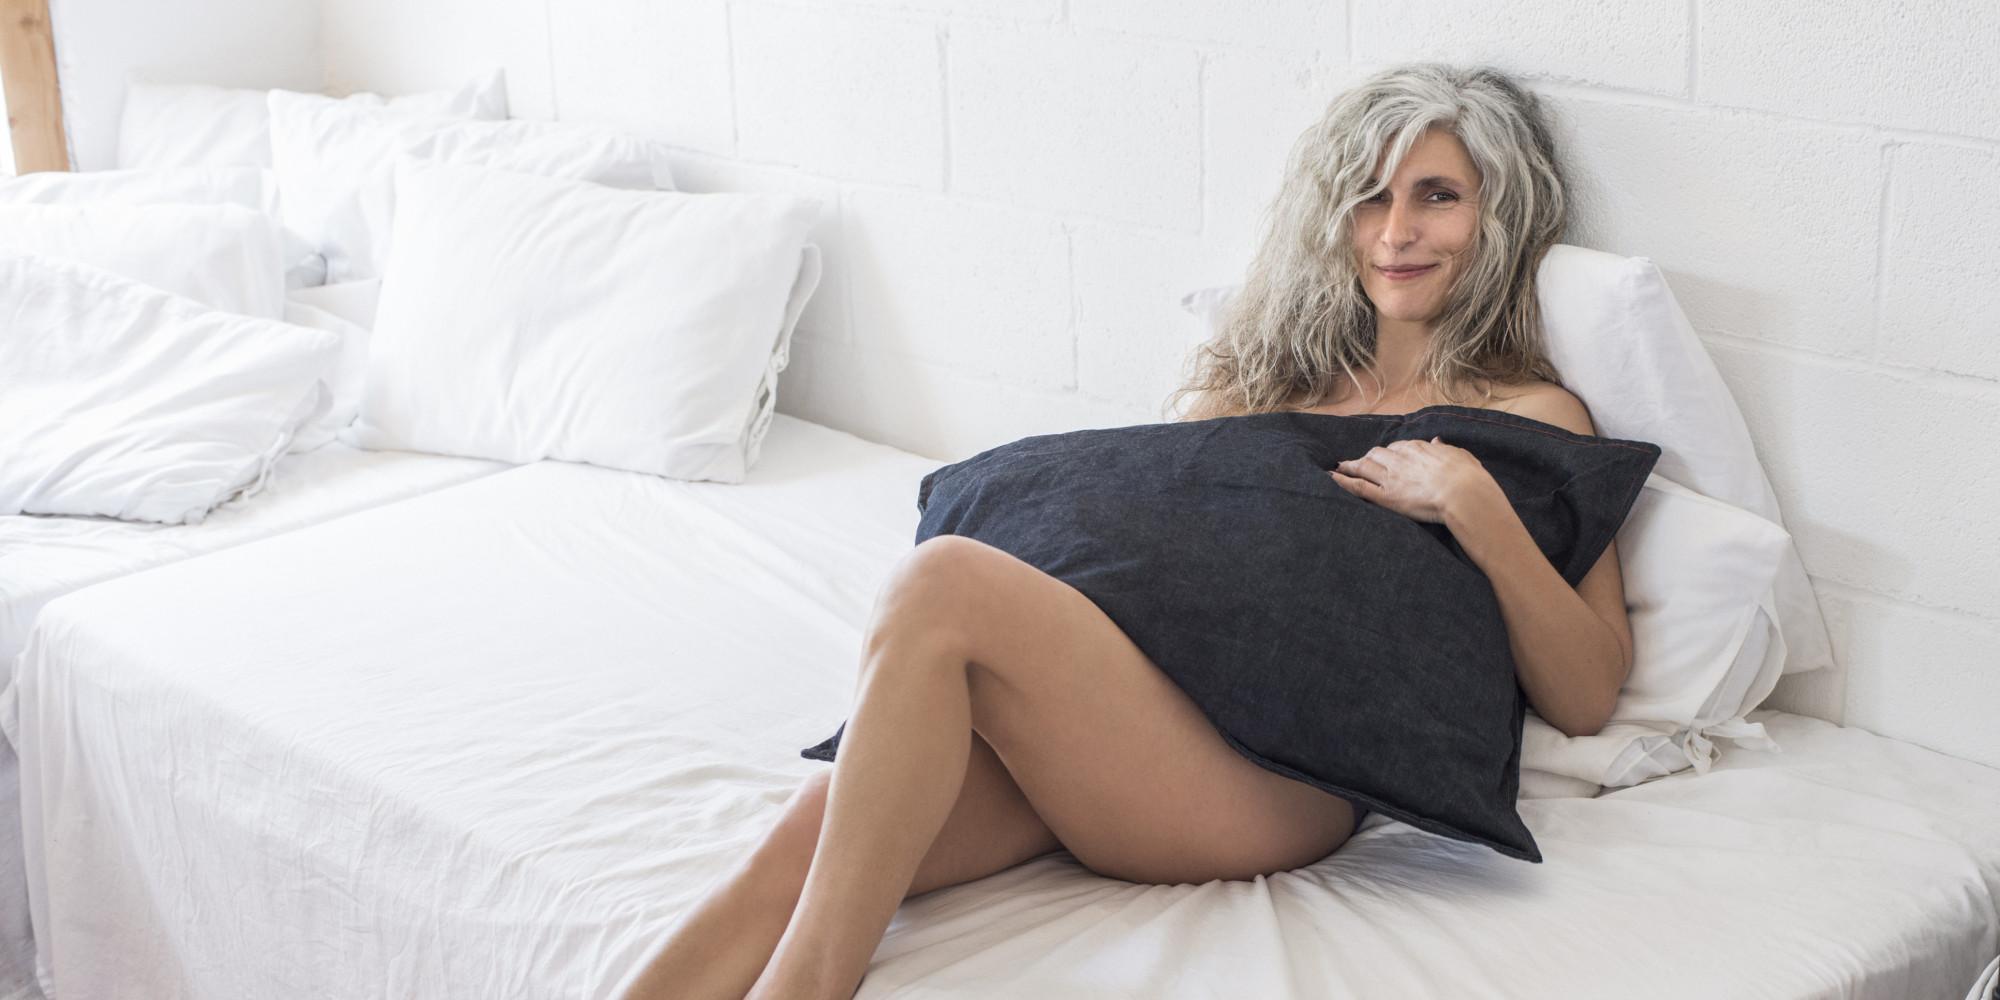 Spanish Perverted 50 To 55 Woman Seeking Man